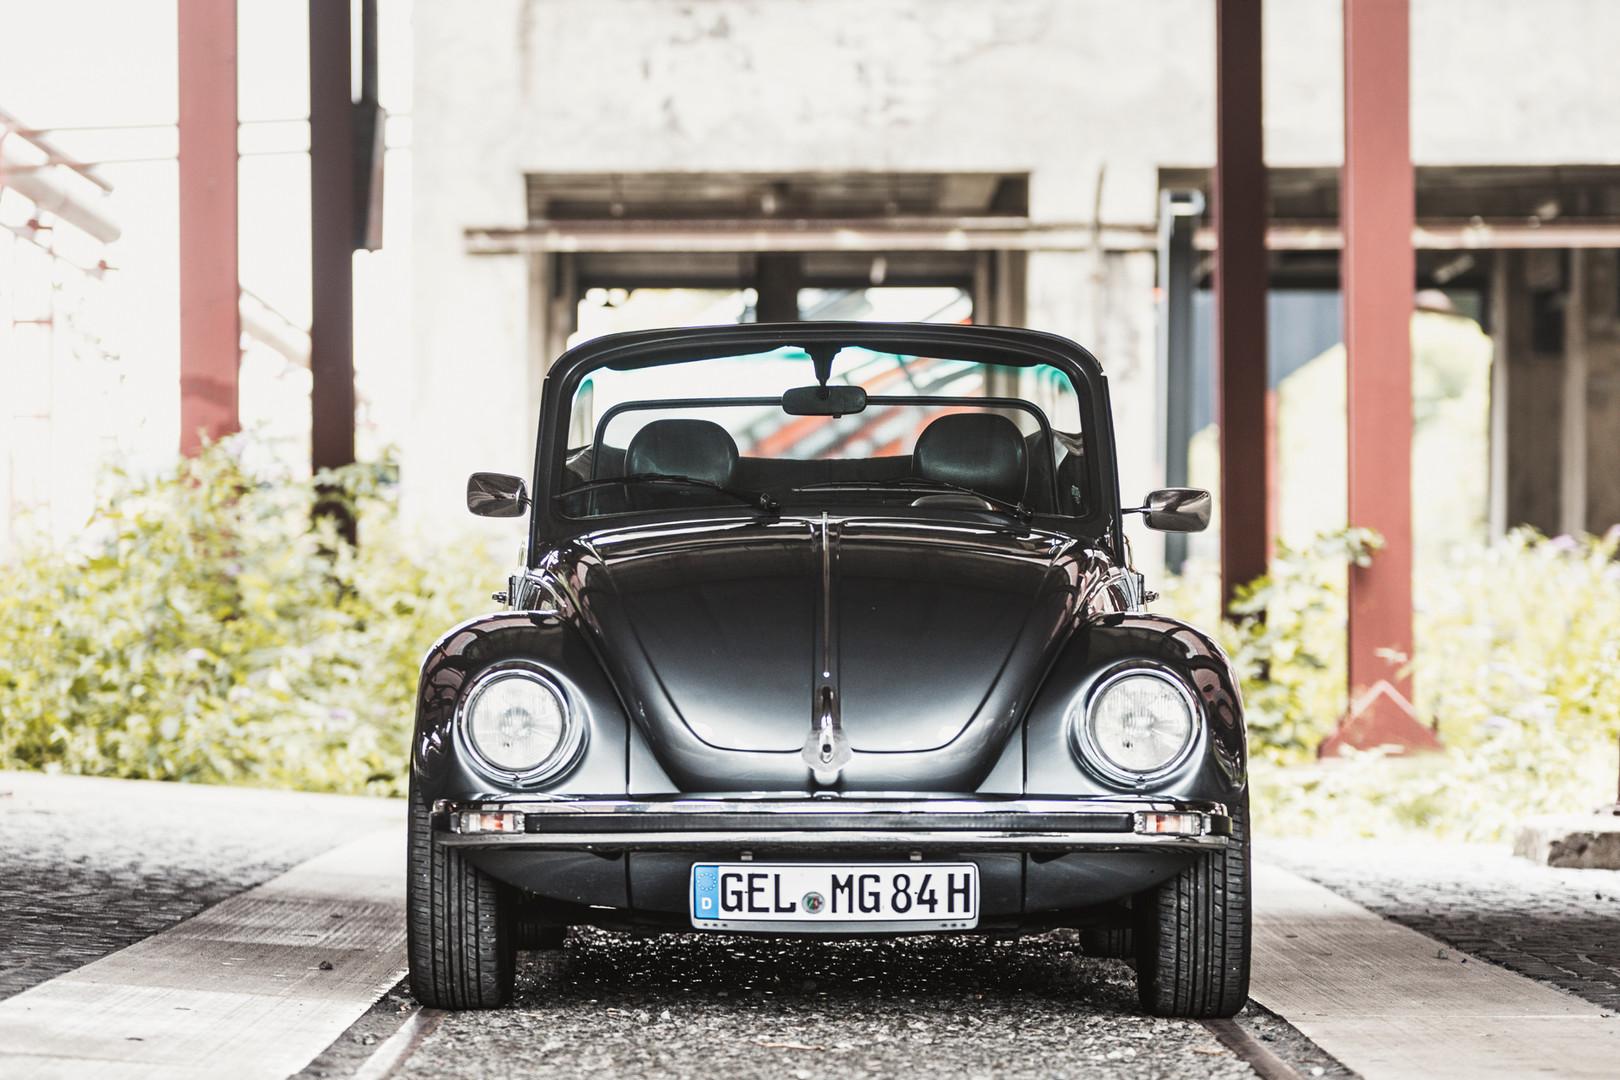 VW Käfer - Zeche Zollverein / Essen